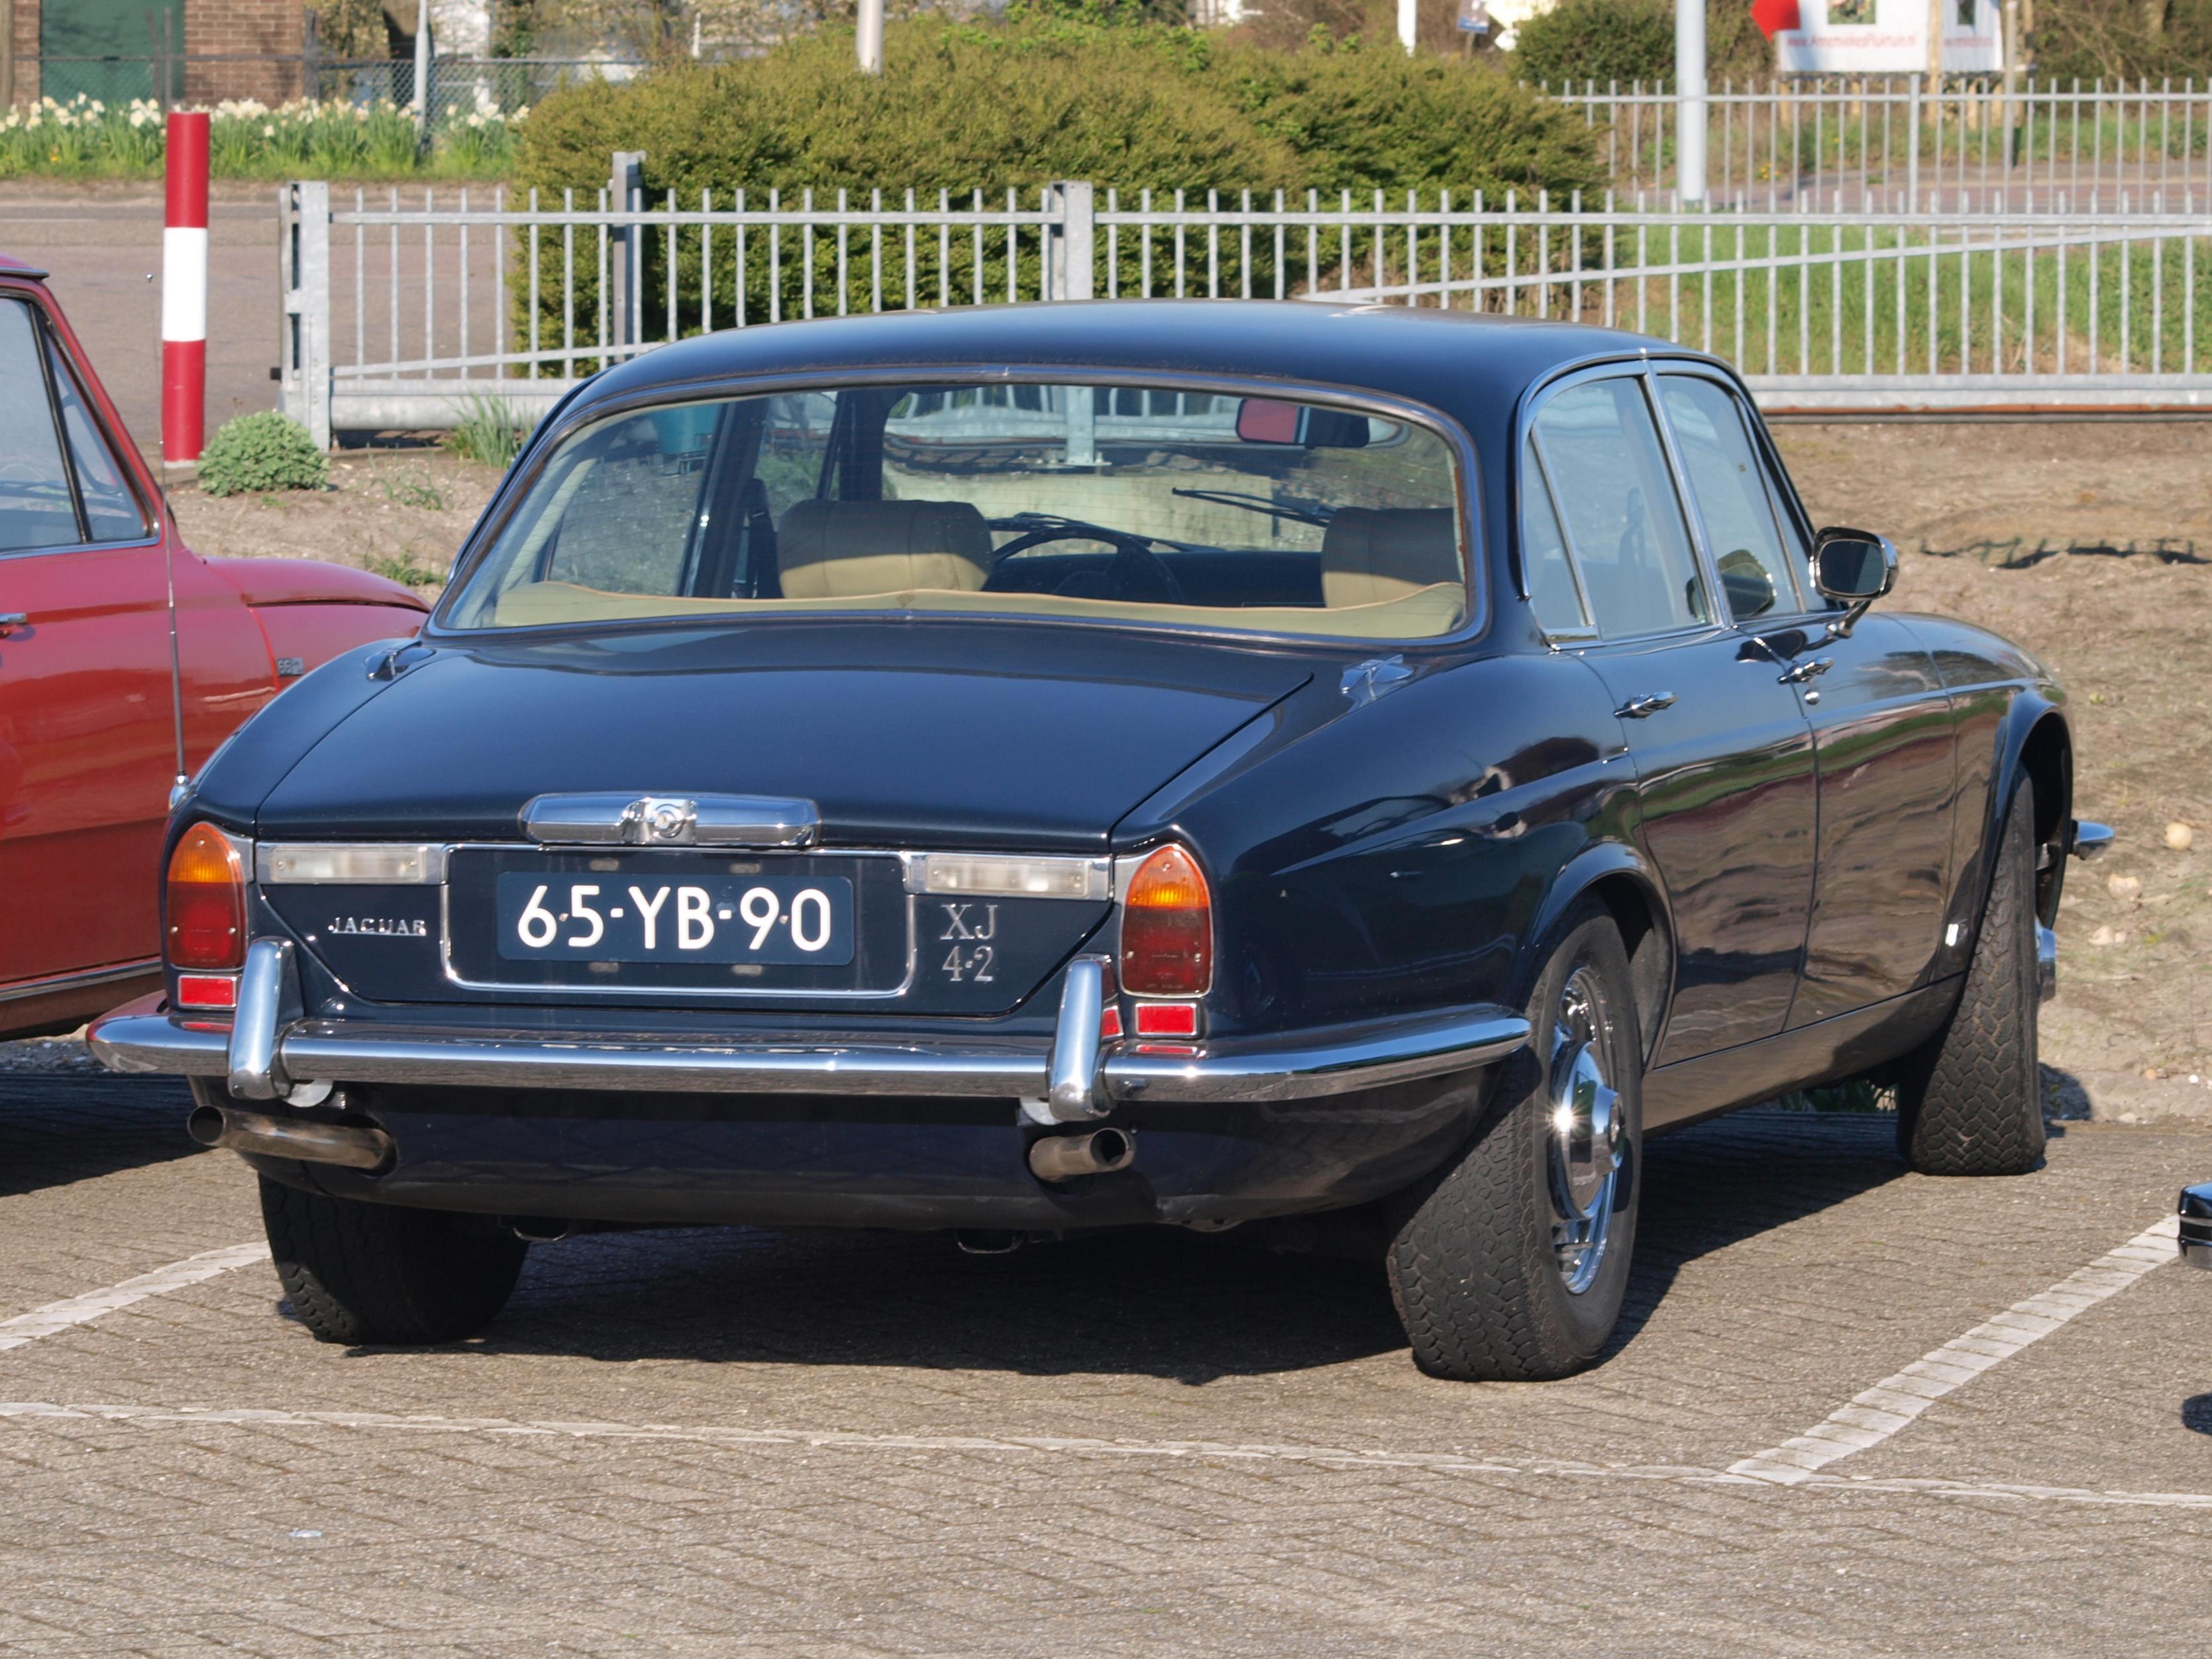 File:1977 Jaguar XJ 6 L, licence no 65-YB-90.JPG - Wikimedia Commons